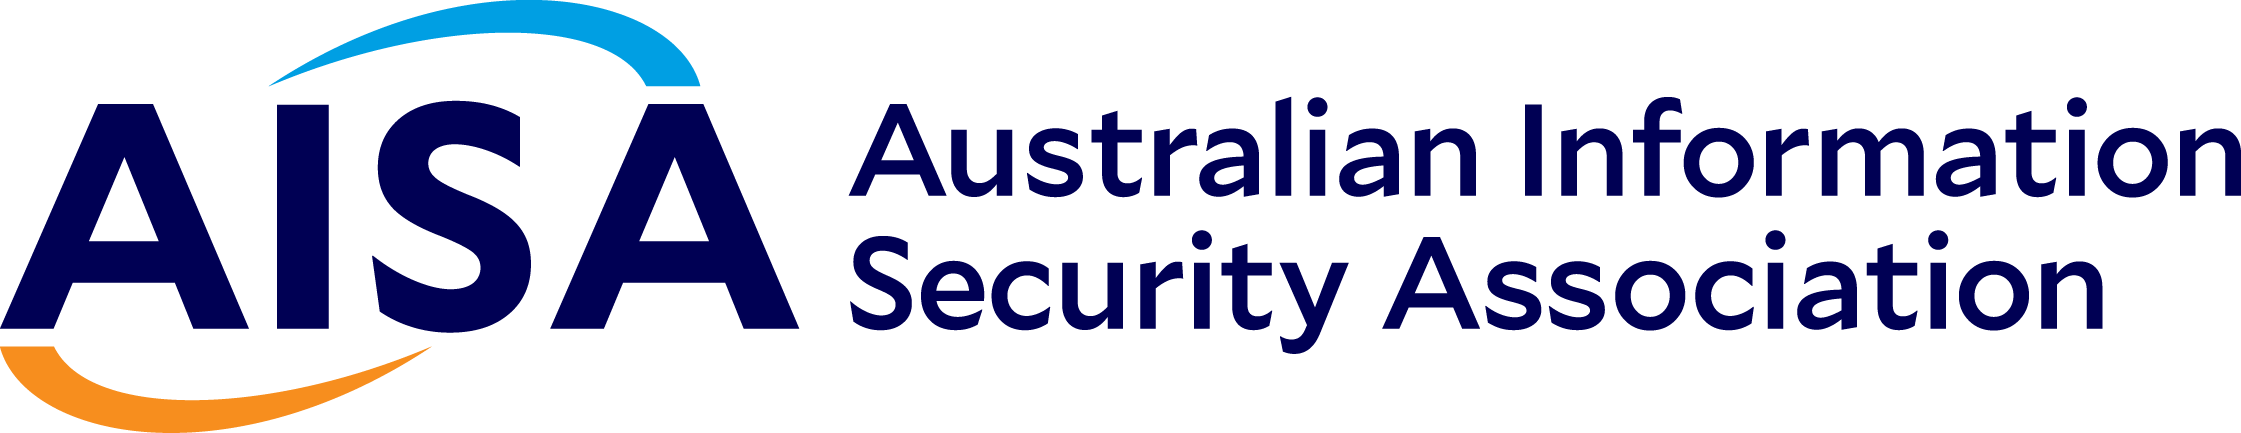 AISA (Australian Information Security Association) のロゴ